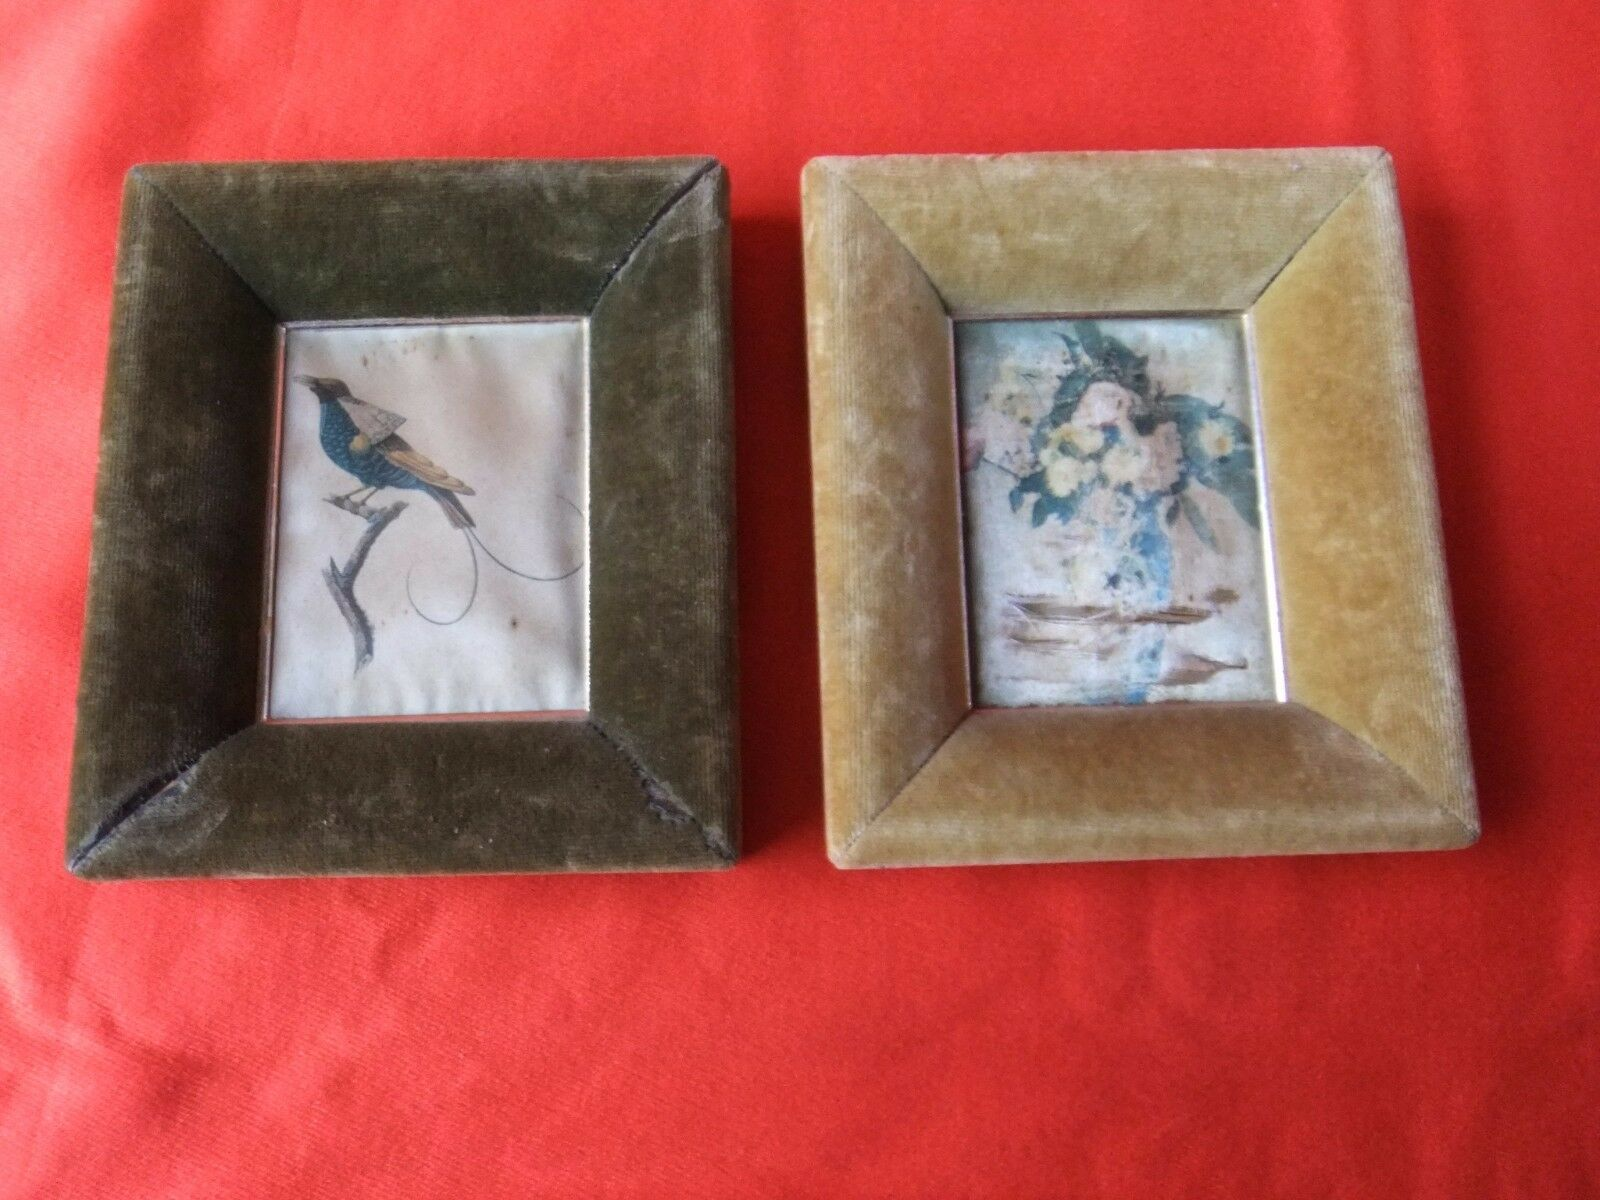 marco miniatura antiguo madera terciopelo pintura en la seda cuadro ...